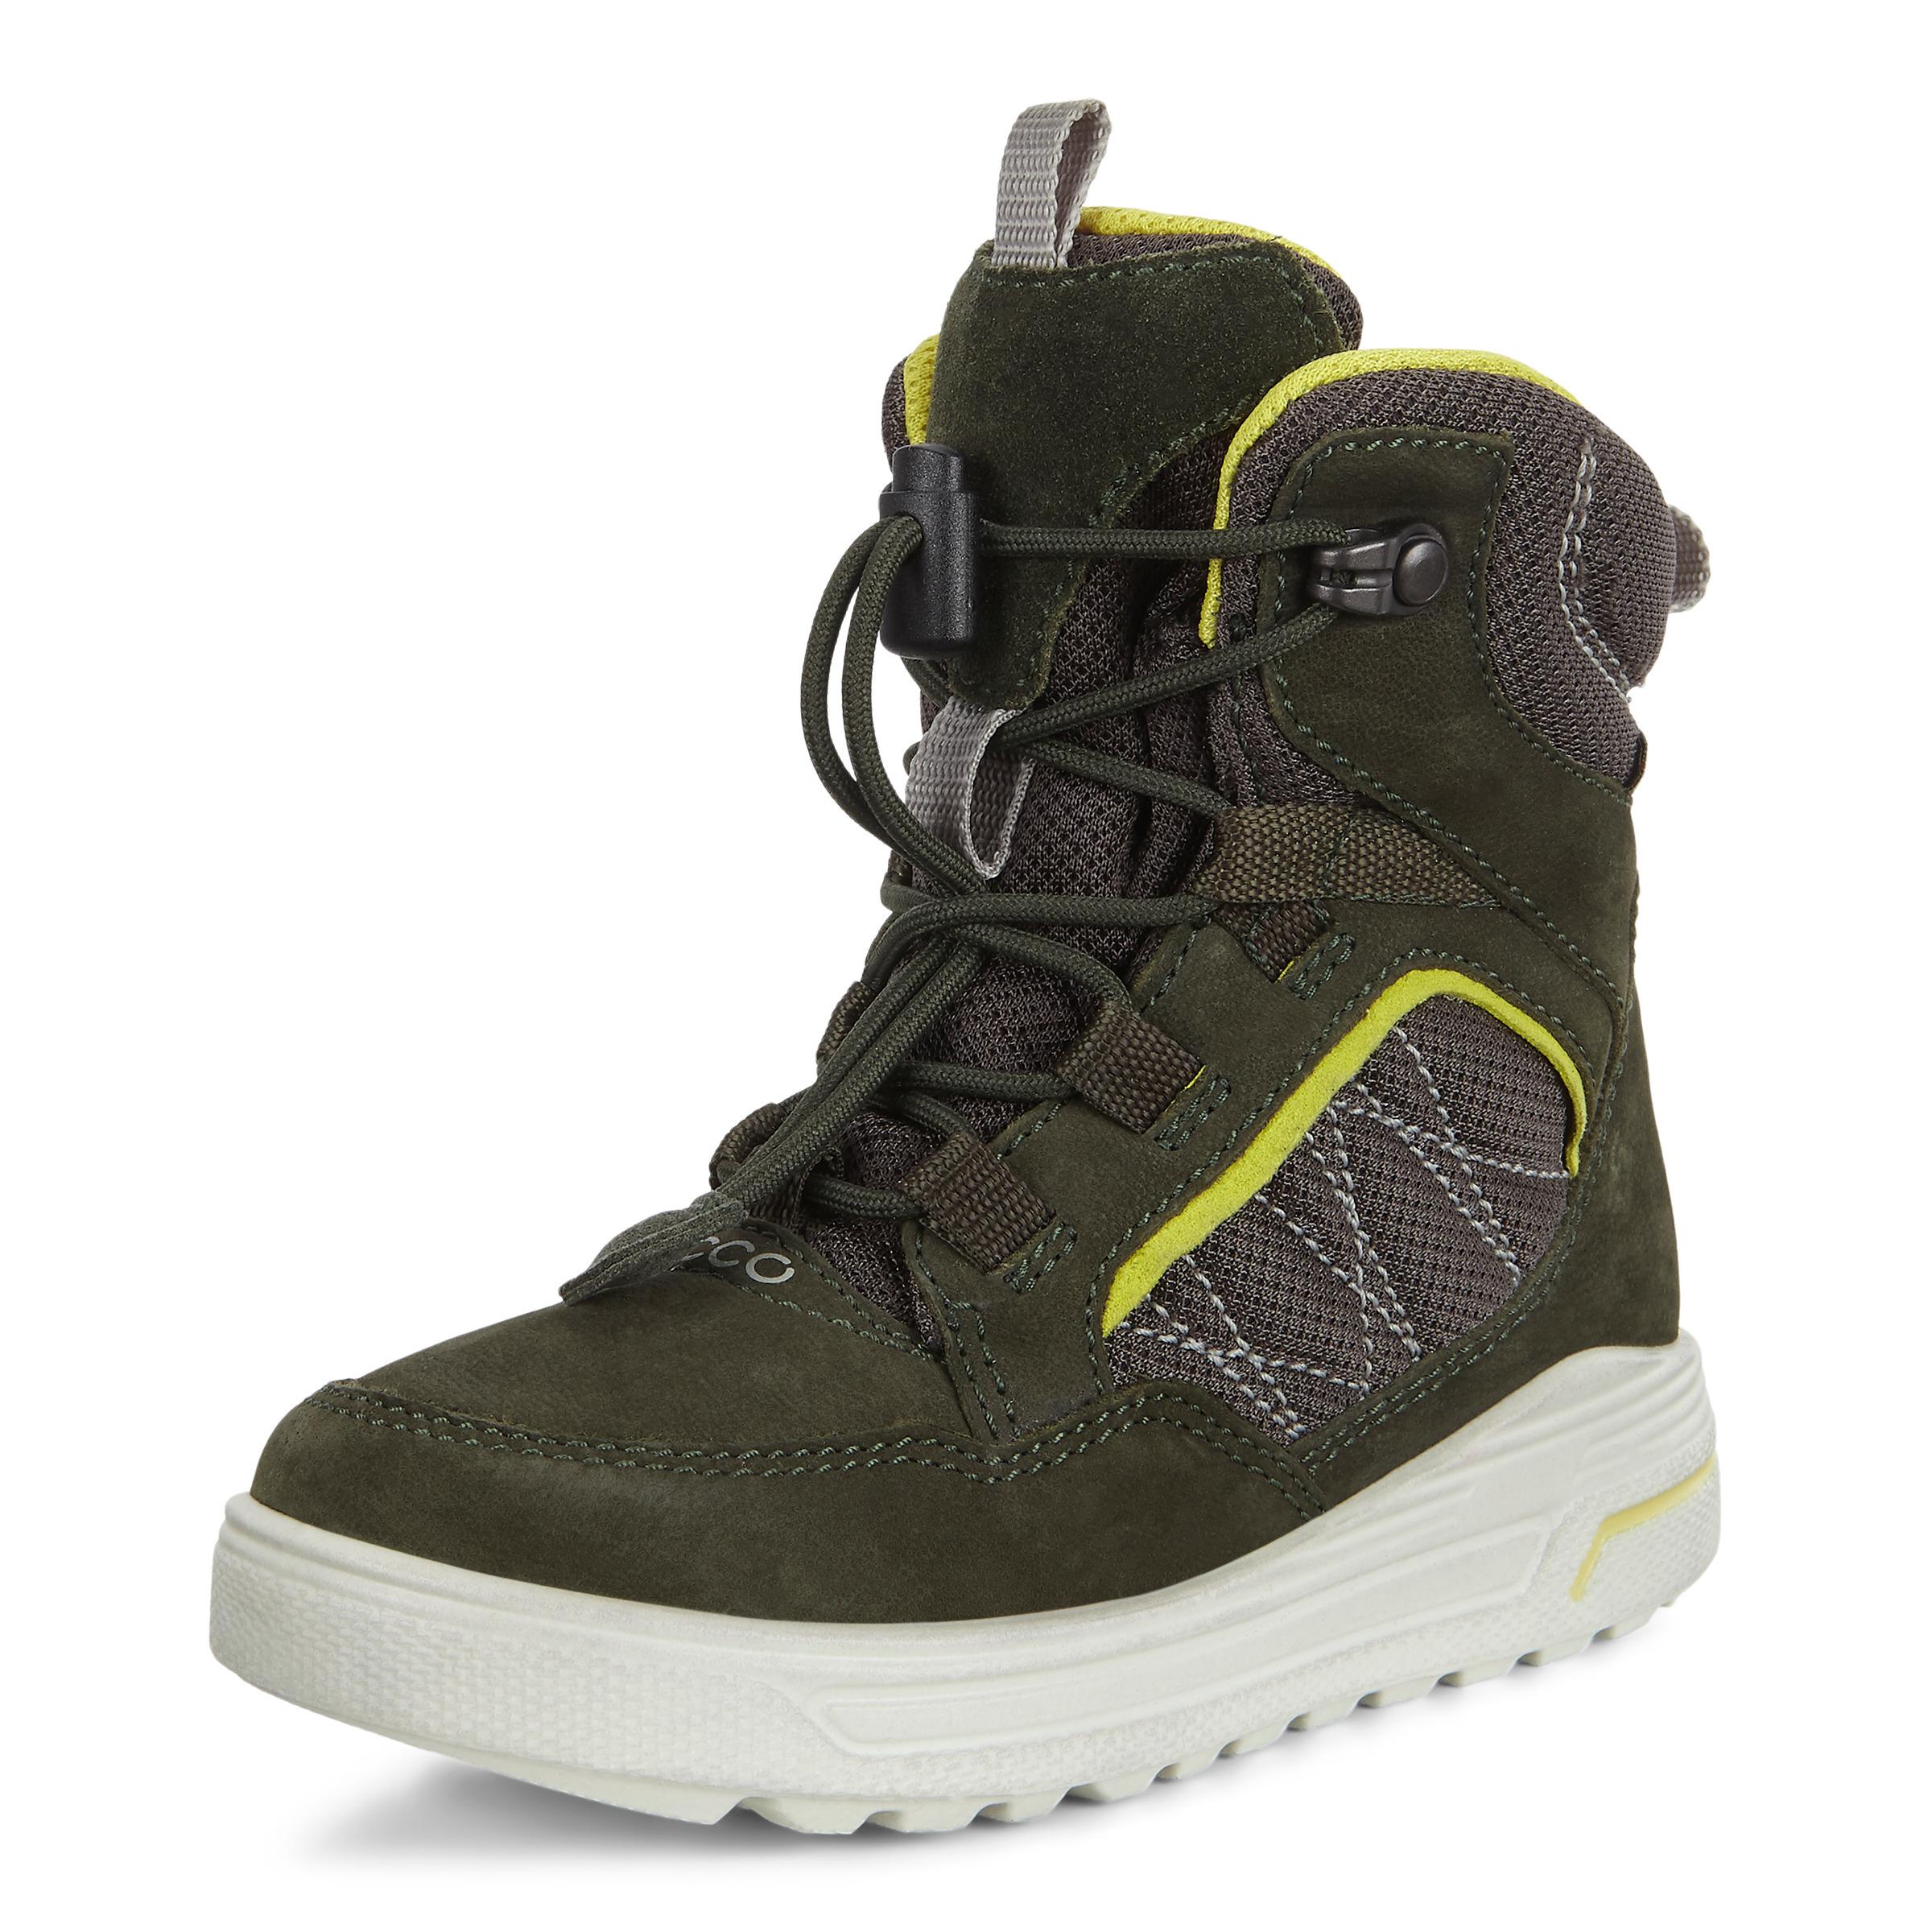 Ecco Urban Snowboarder støvle